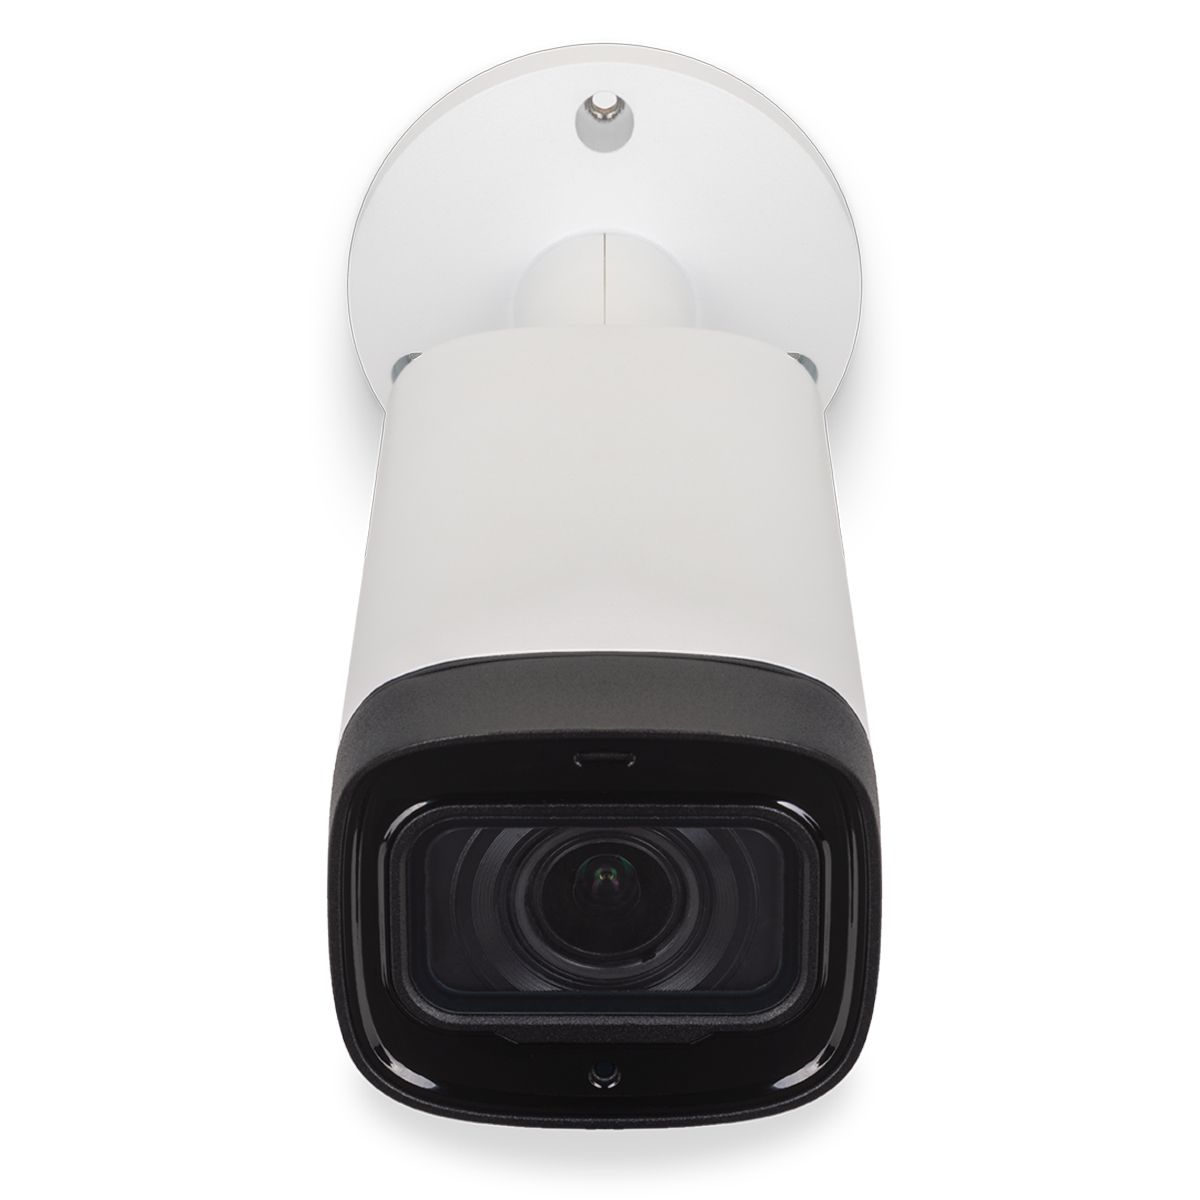 Câmera Intelbras HD 720p Varifocal VHD 3140 VF G5 com Visão Noturna 40m Bullet Resistente à Chuva IP66  - Tudo Forte